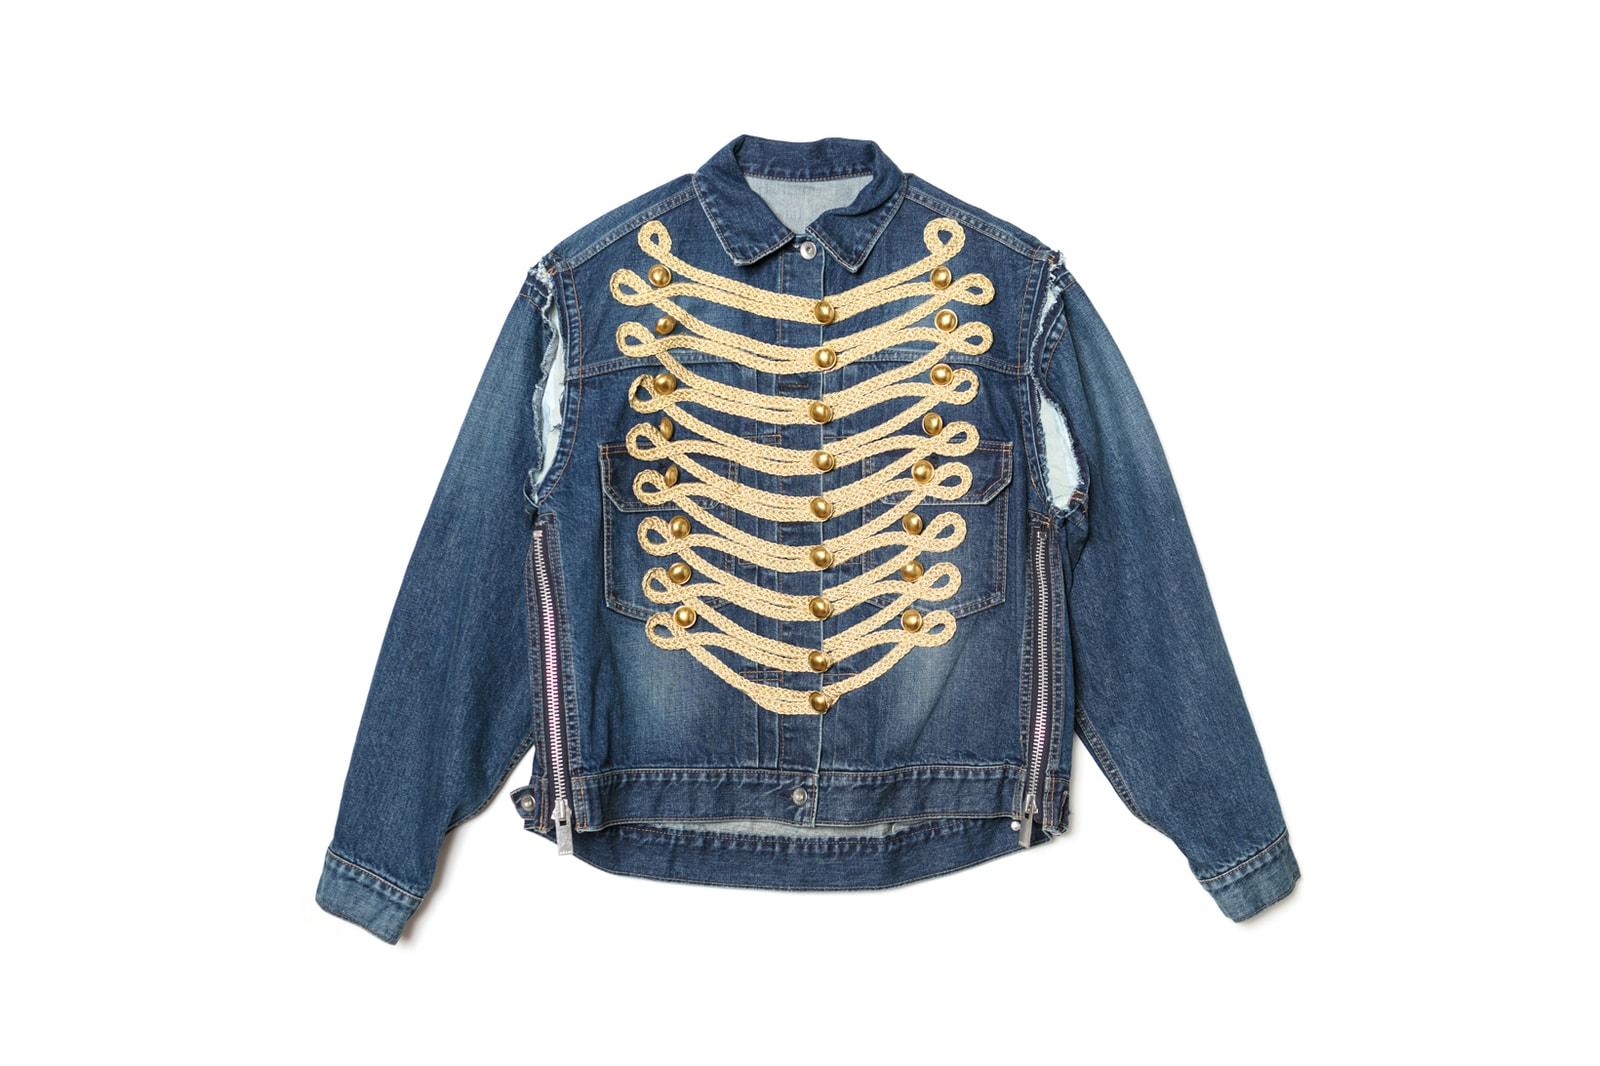 Dover Street Market x Sacai Gem Denim Jacket Collection Blue Black